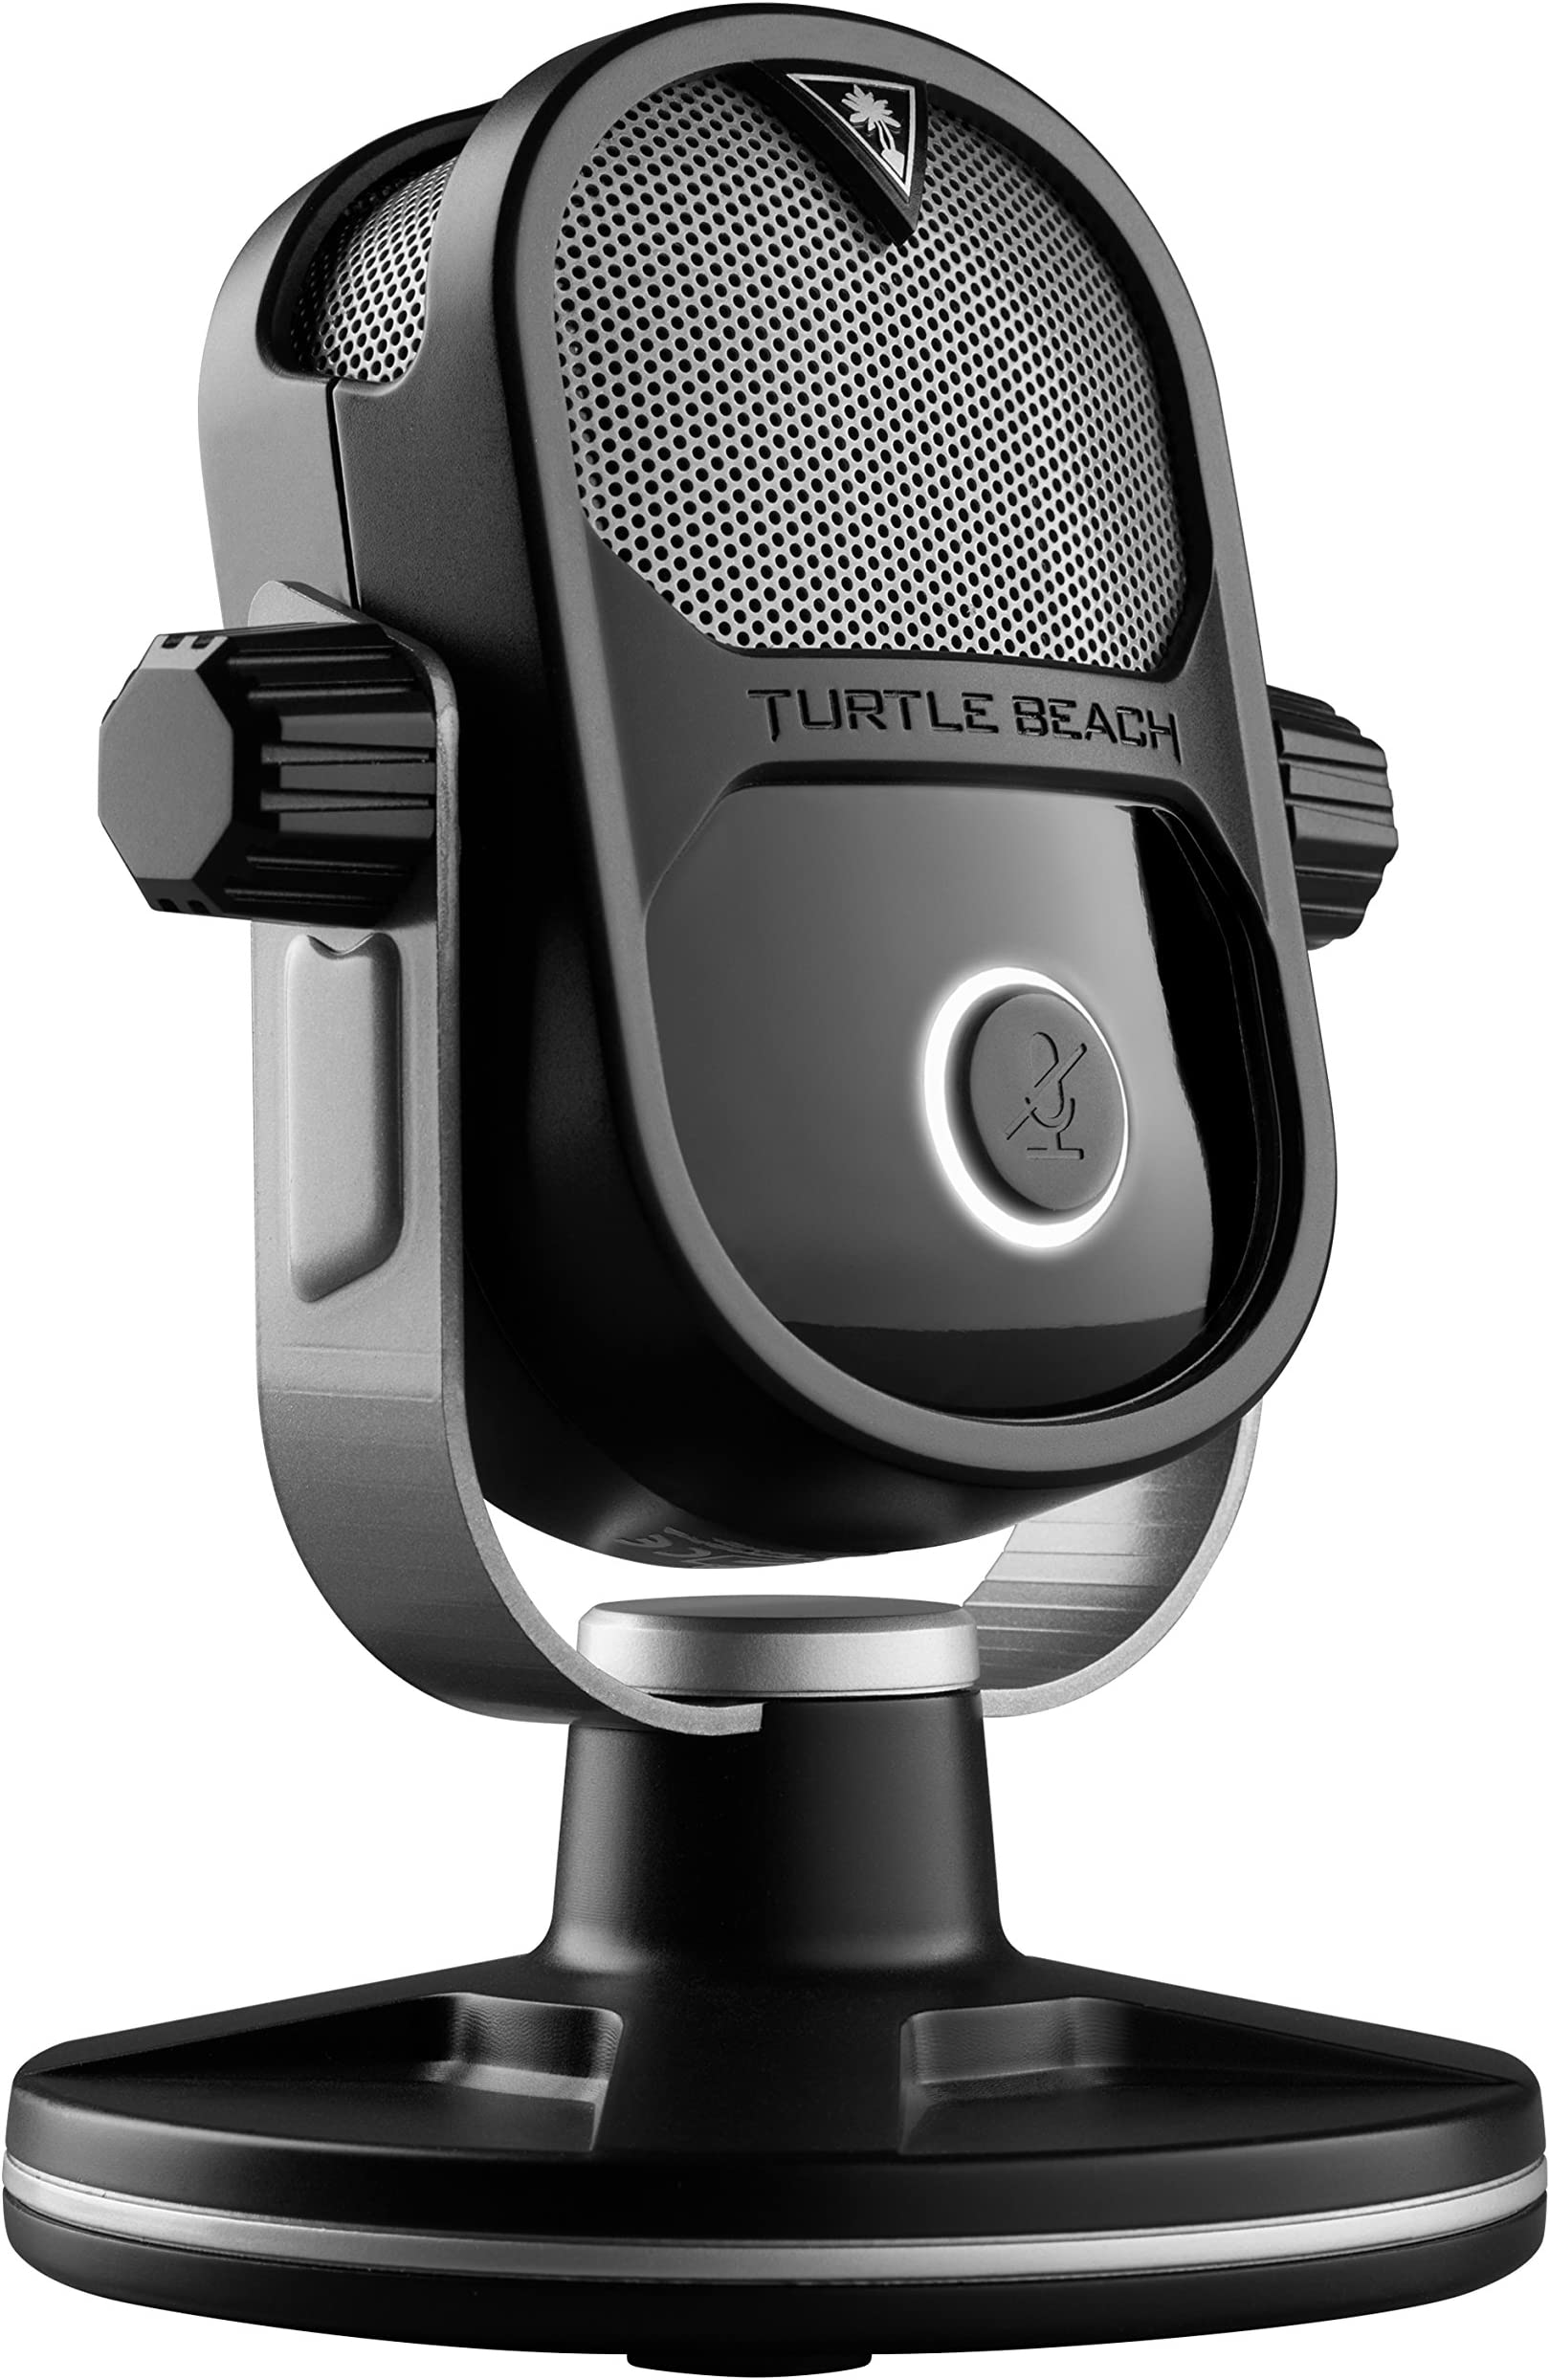 Amazon.com: Turtle Beach - Universal digital USB Stream Mic ...